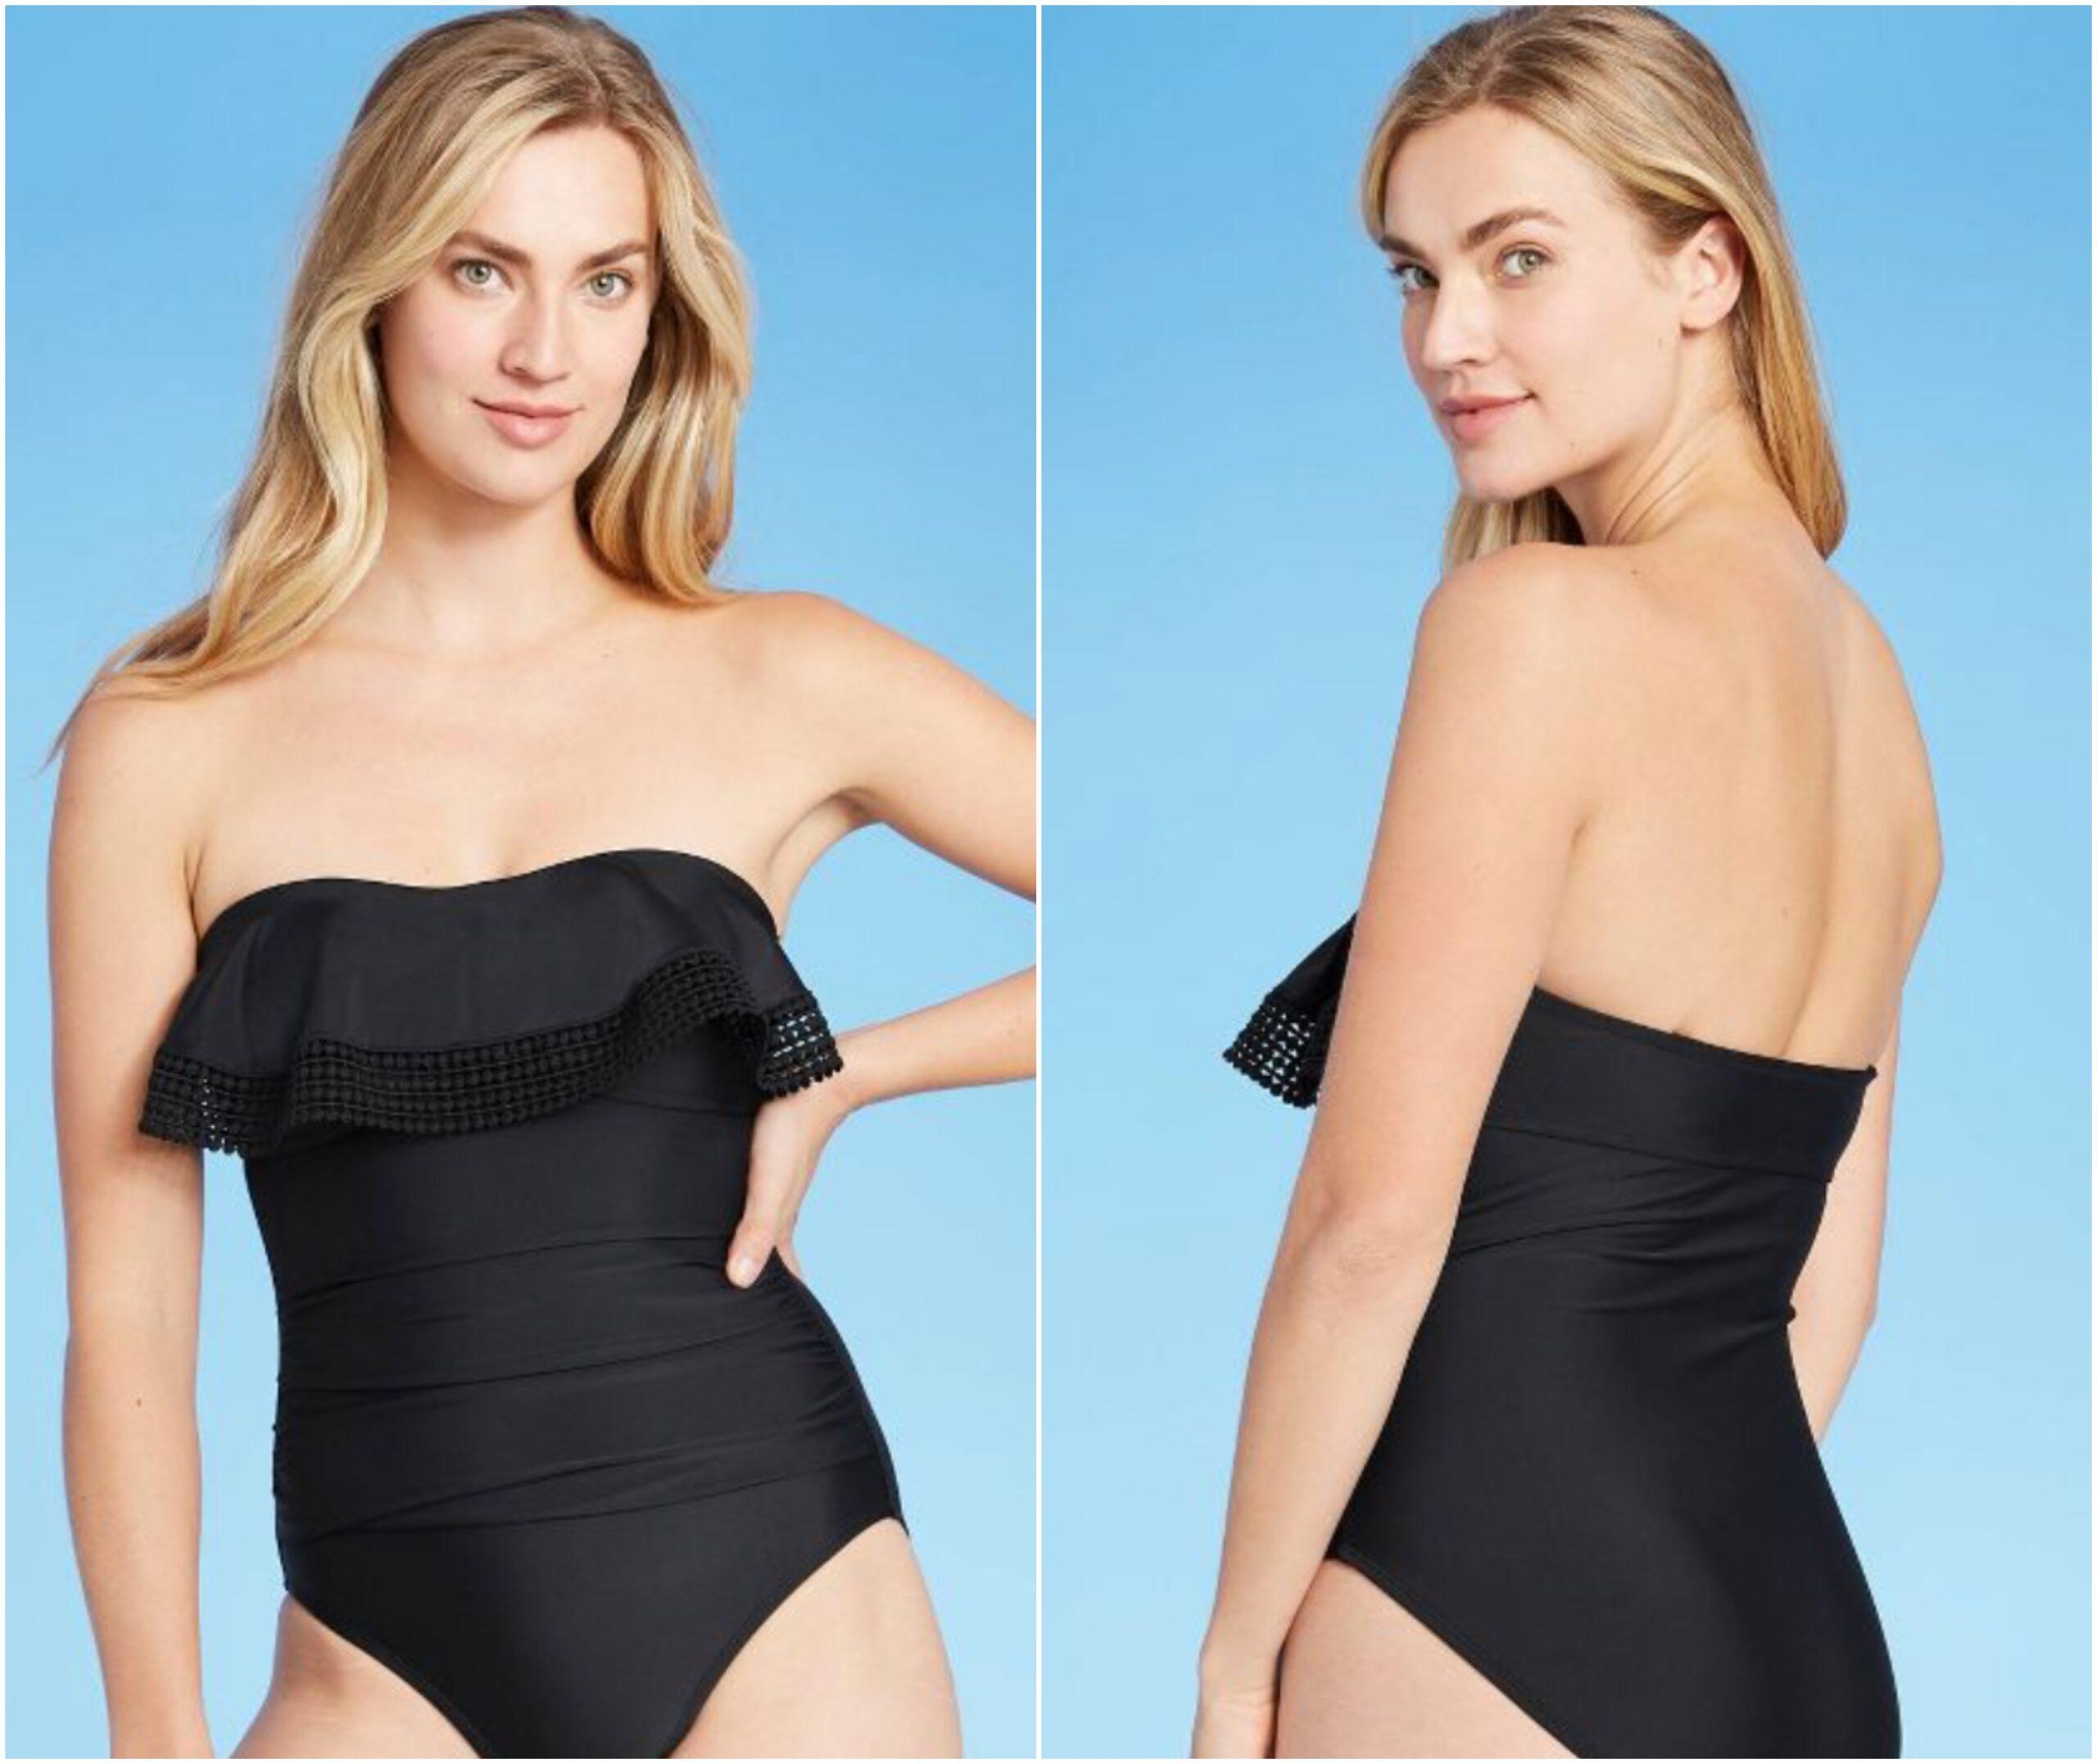 Black Strapless One Piece Swimsuit - Target Swimwear for Women